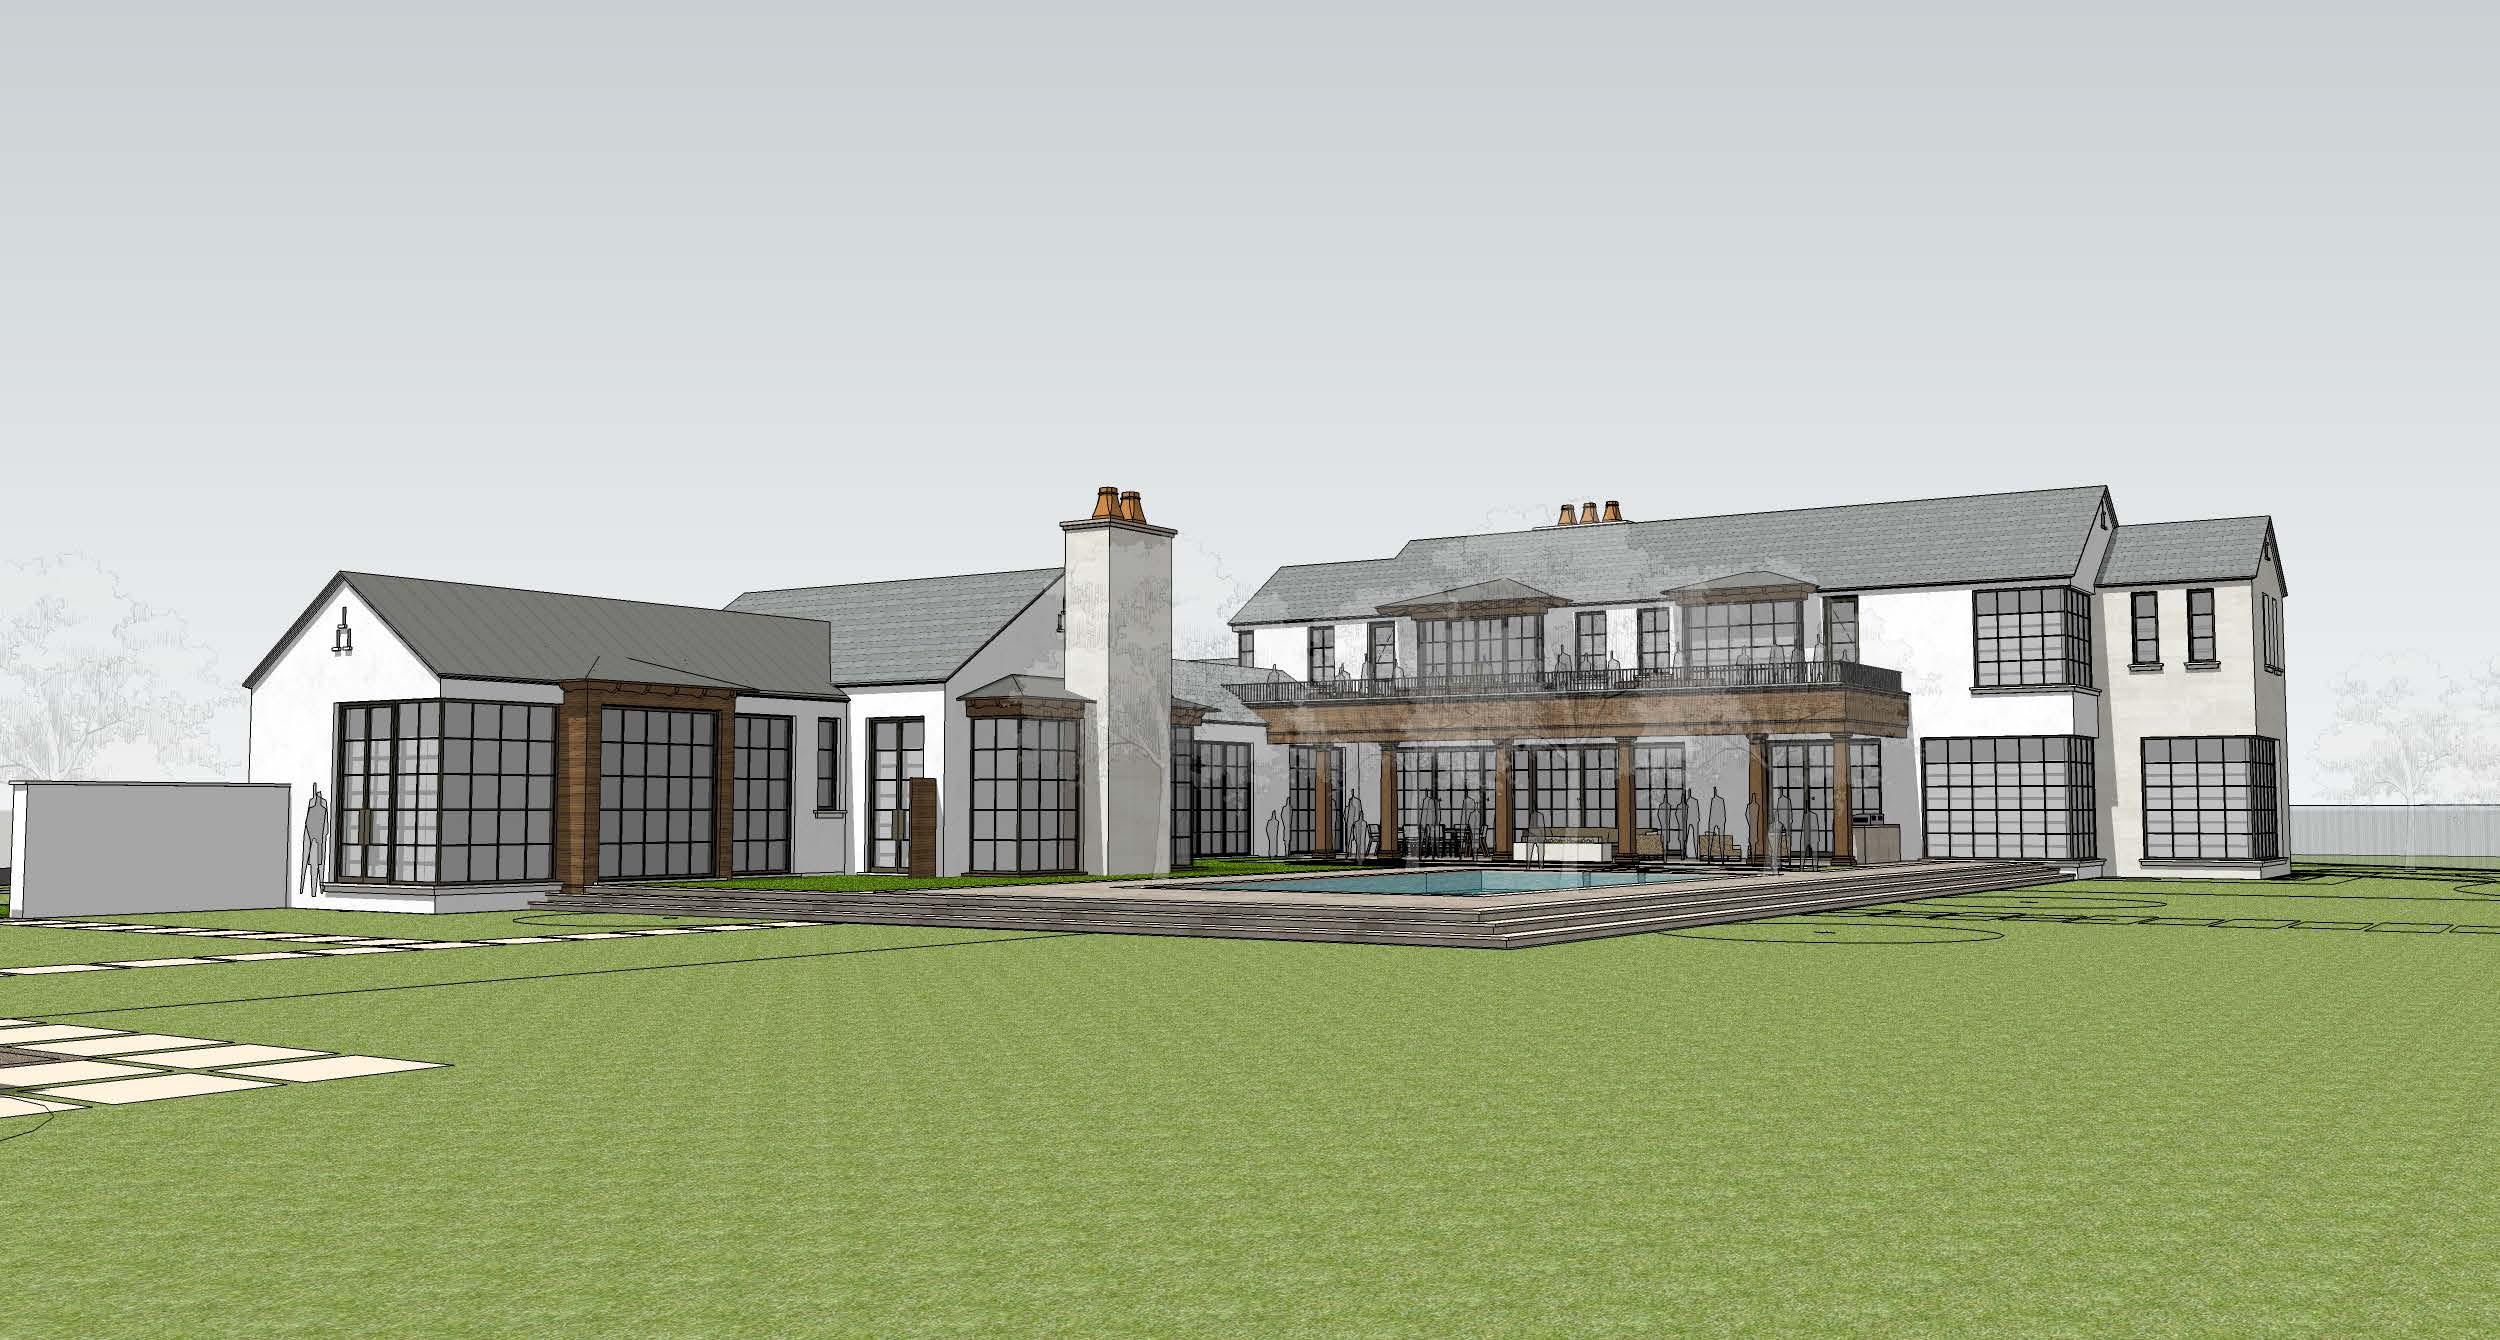 17-080_Vyas Residence_Model Views_Design Review_Page_7.jpg